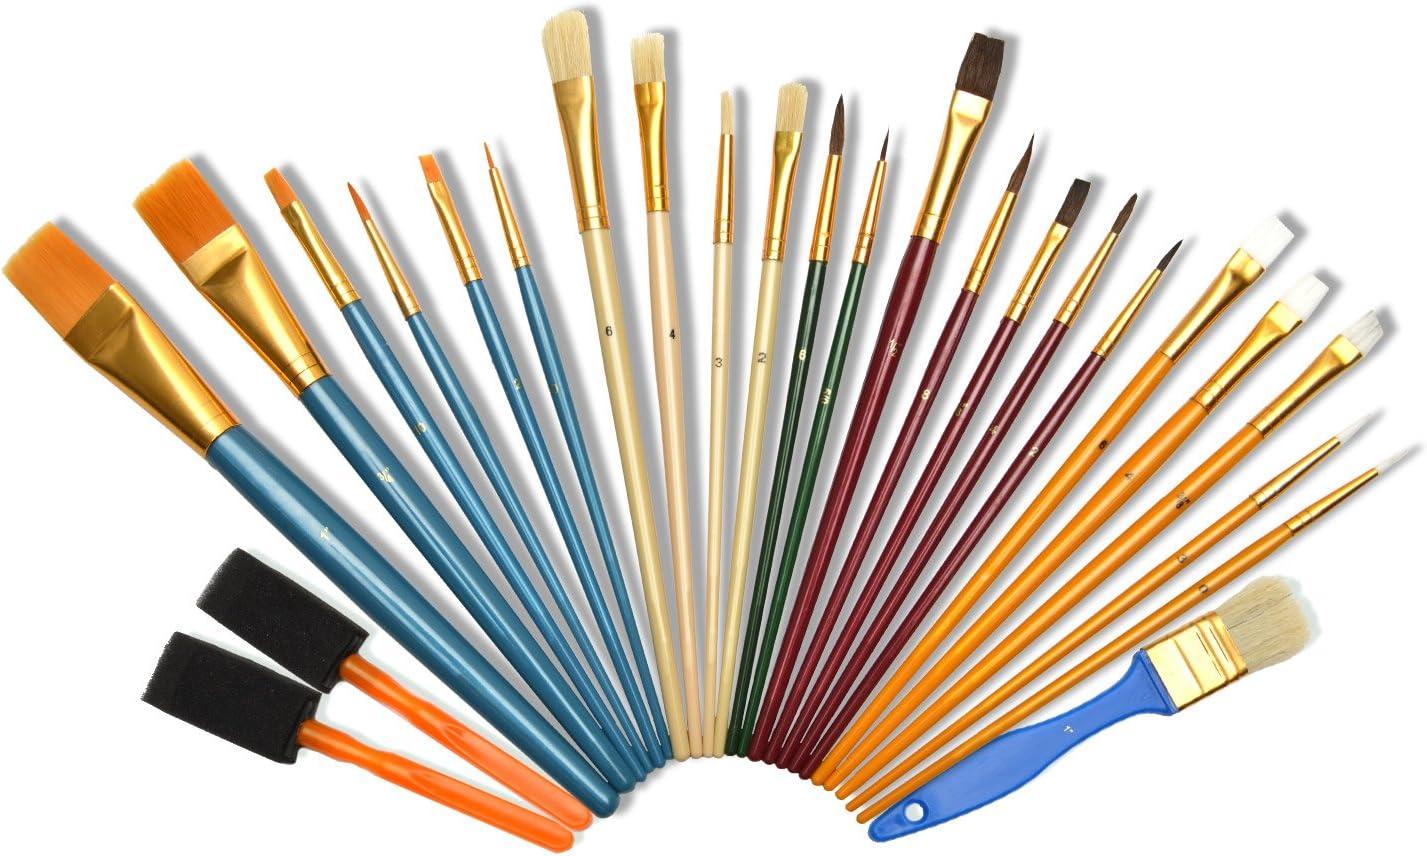 3 10 cm ponti recinzioni Set di 4 pennelli da pittura armadi per pittori e proprietari di casa per porte 4 misure da 1 2